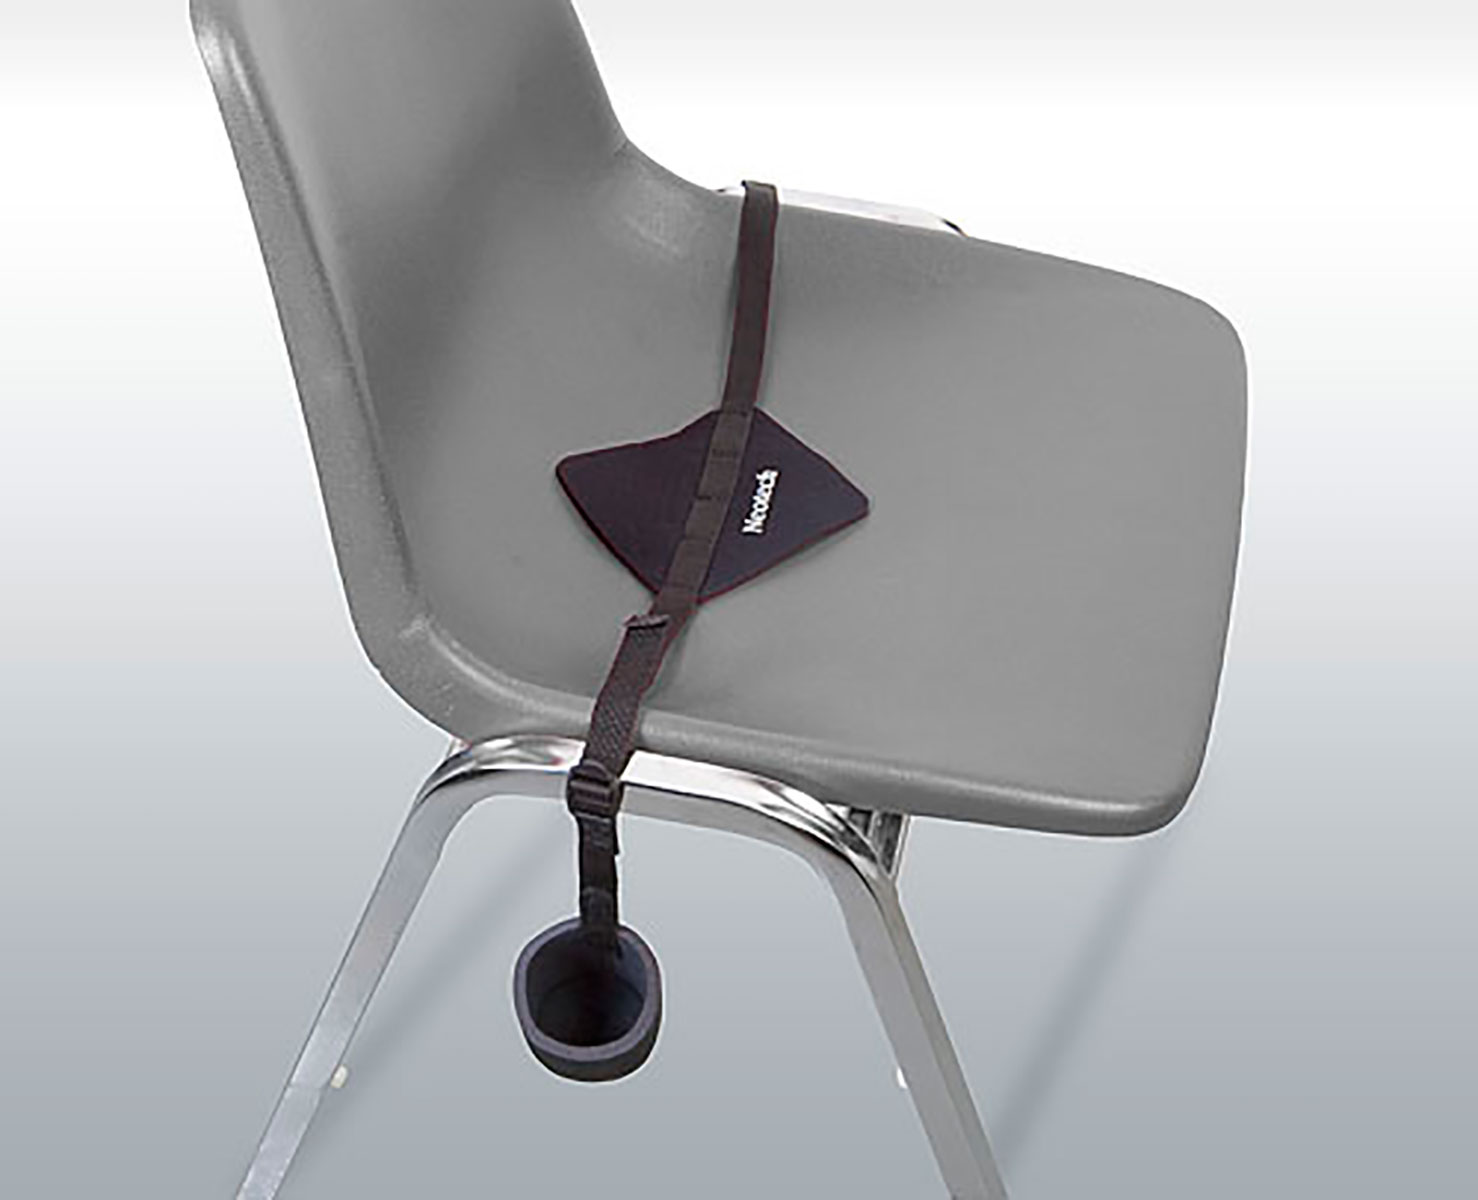 Neotech Bassoon Seat Strap